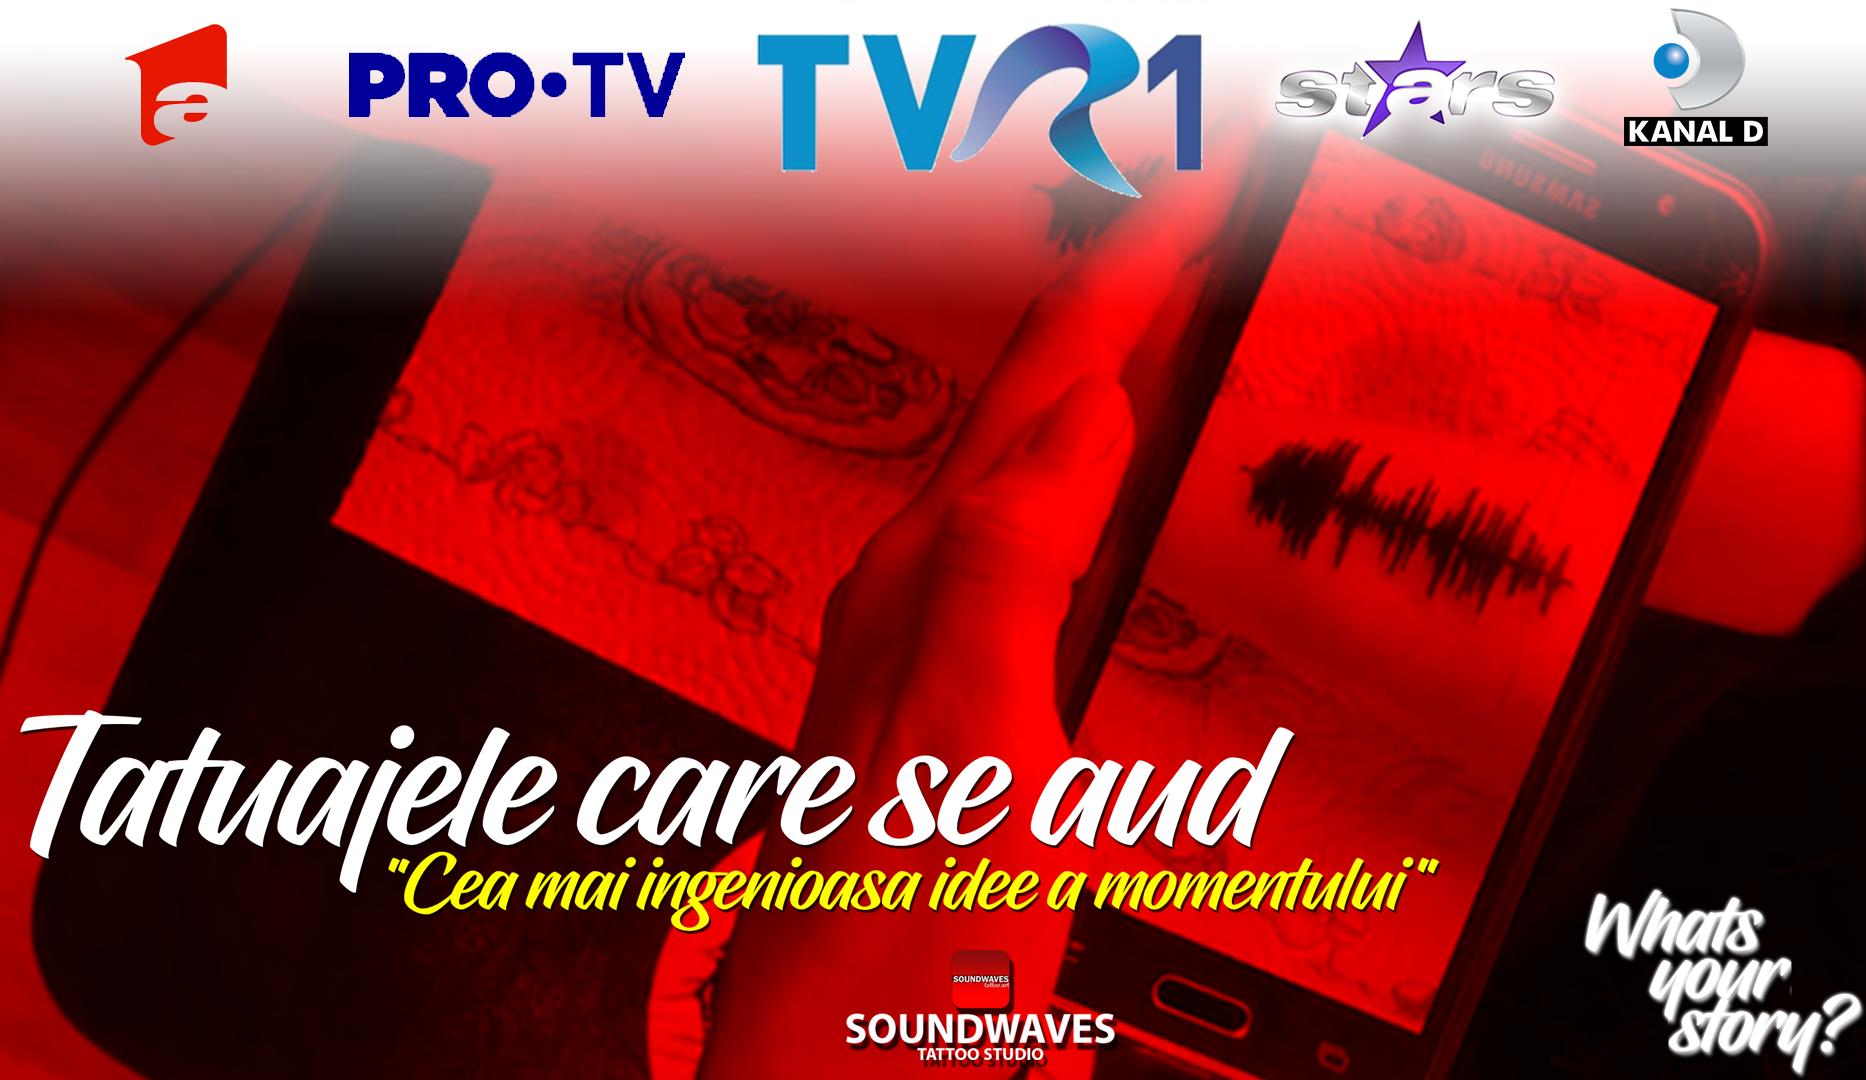 Tatuaje audio - Soundwaves Tattoo - Reportaj TVR1